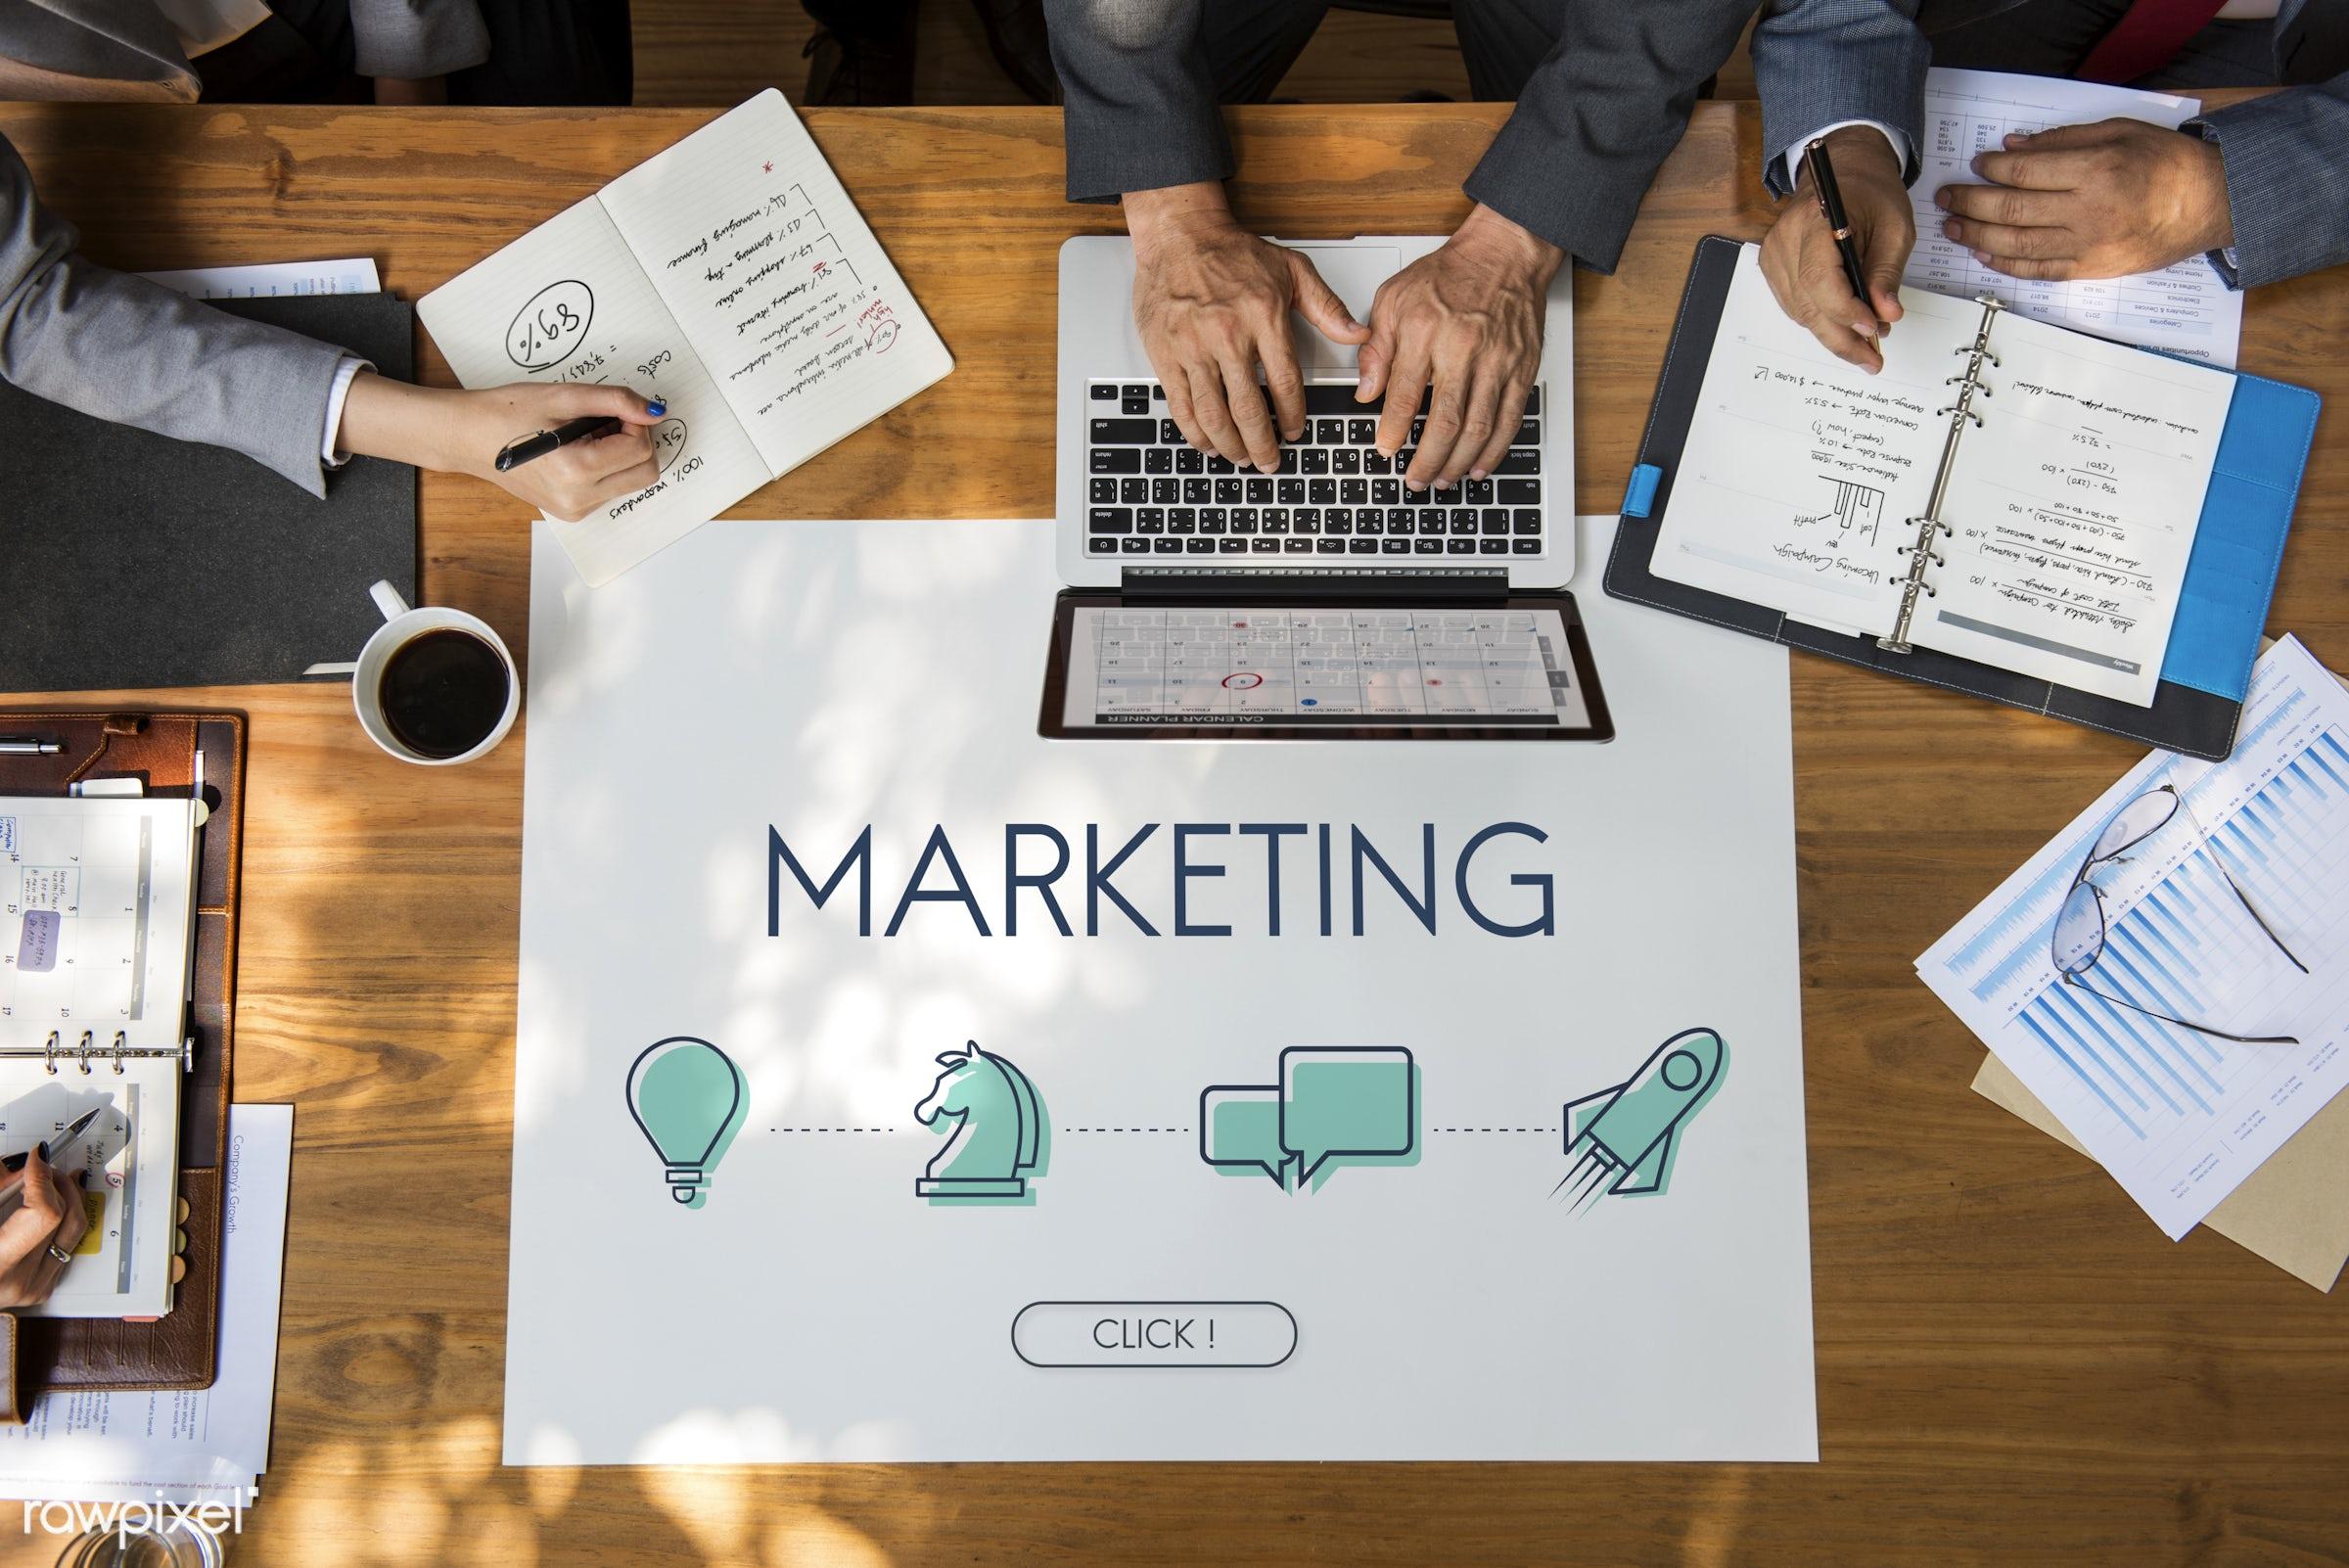 asian, brainstorming, business, businessmen, businesswomen, campaign, company, development, devices, digital, digital device...